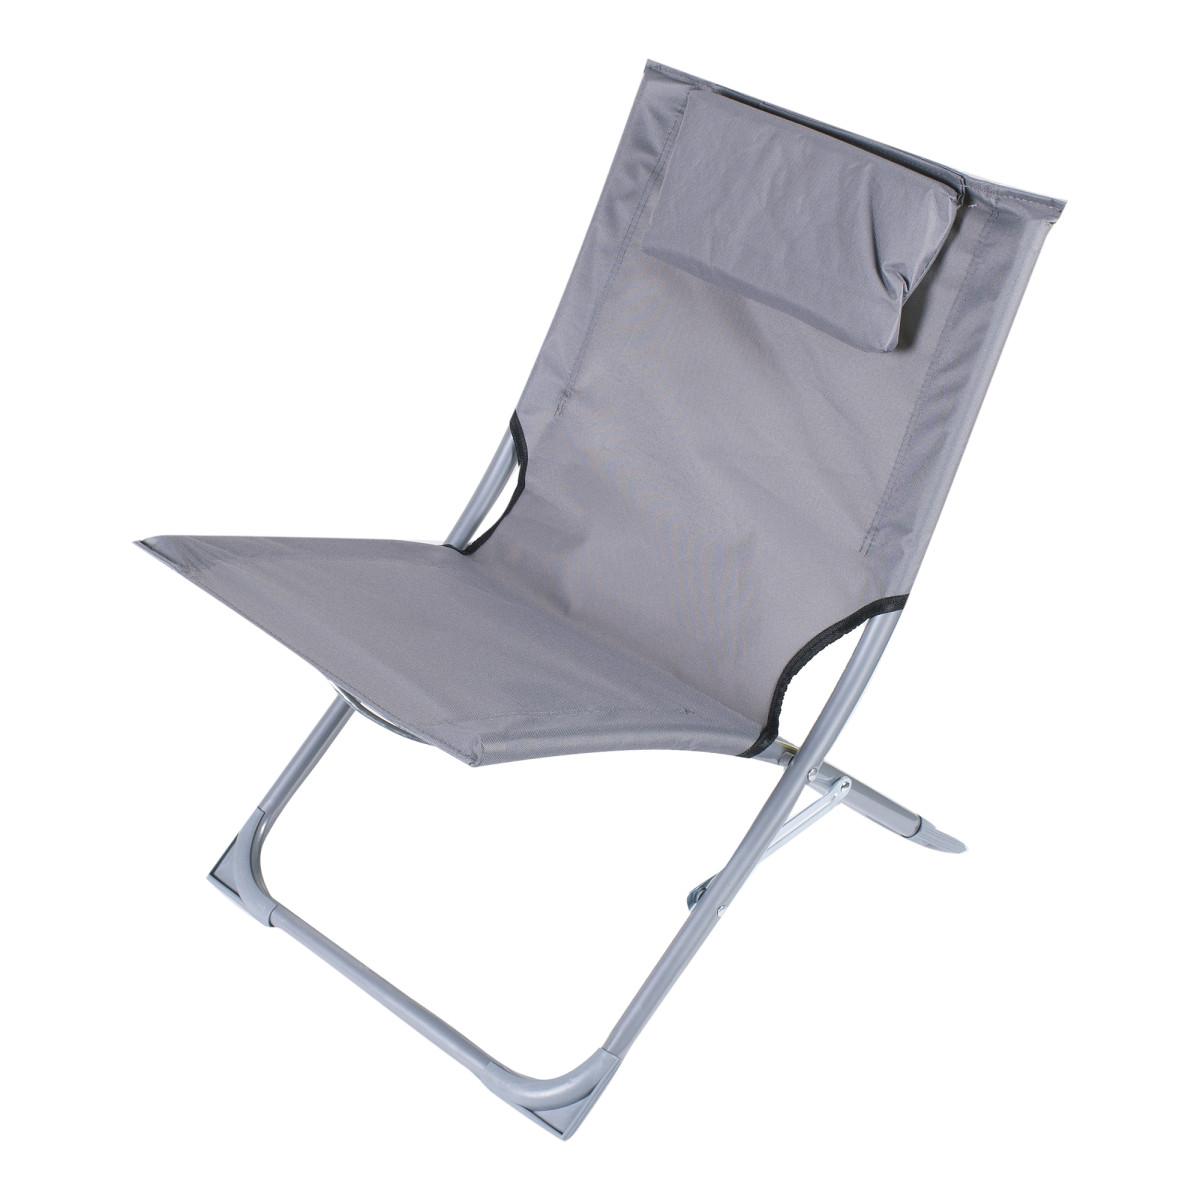 Стул пляжный серый 400x610x400 мм металл/ткань